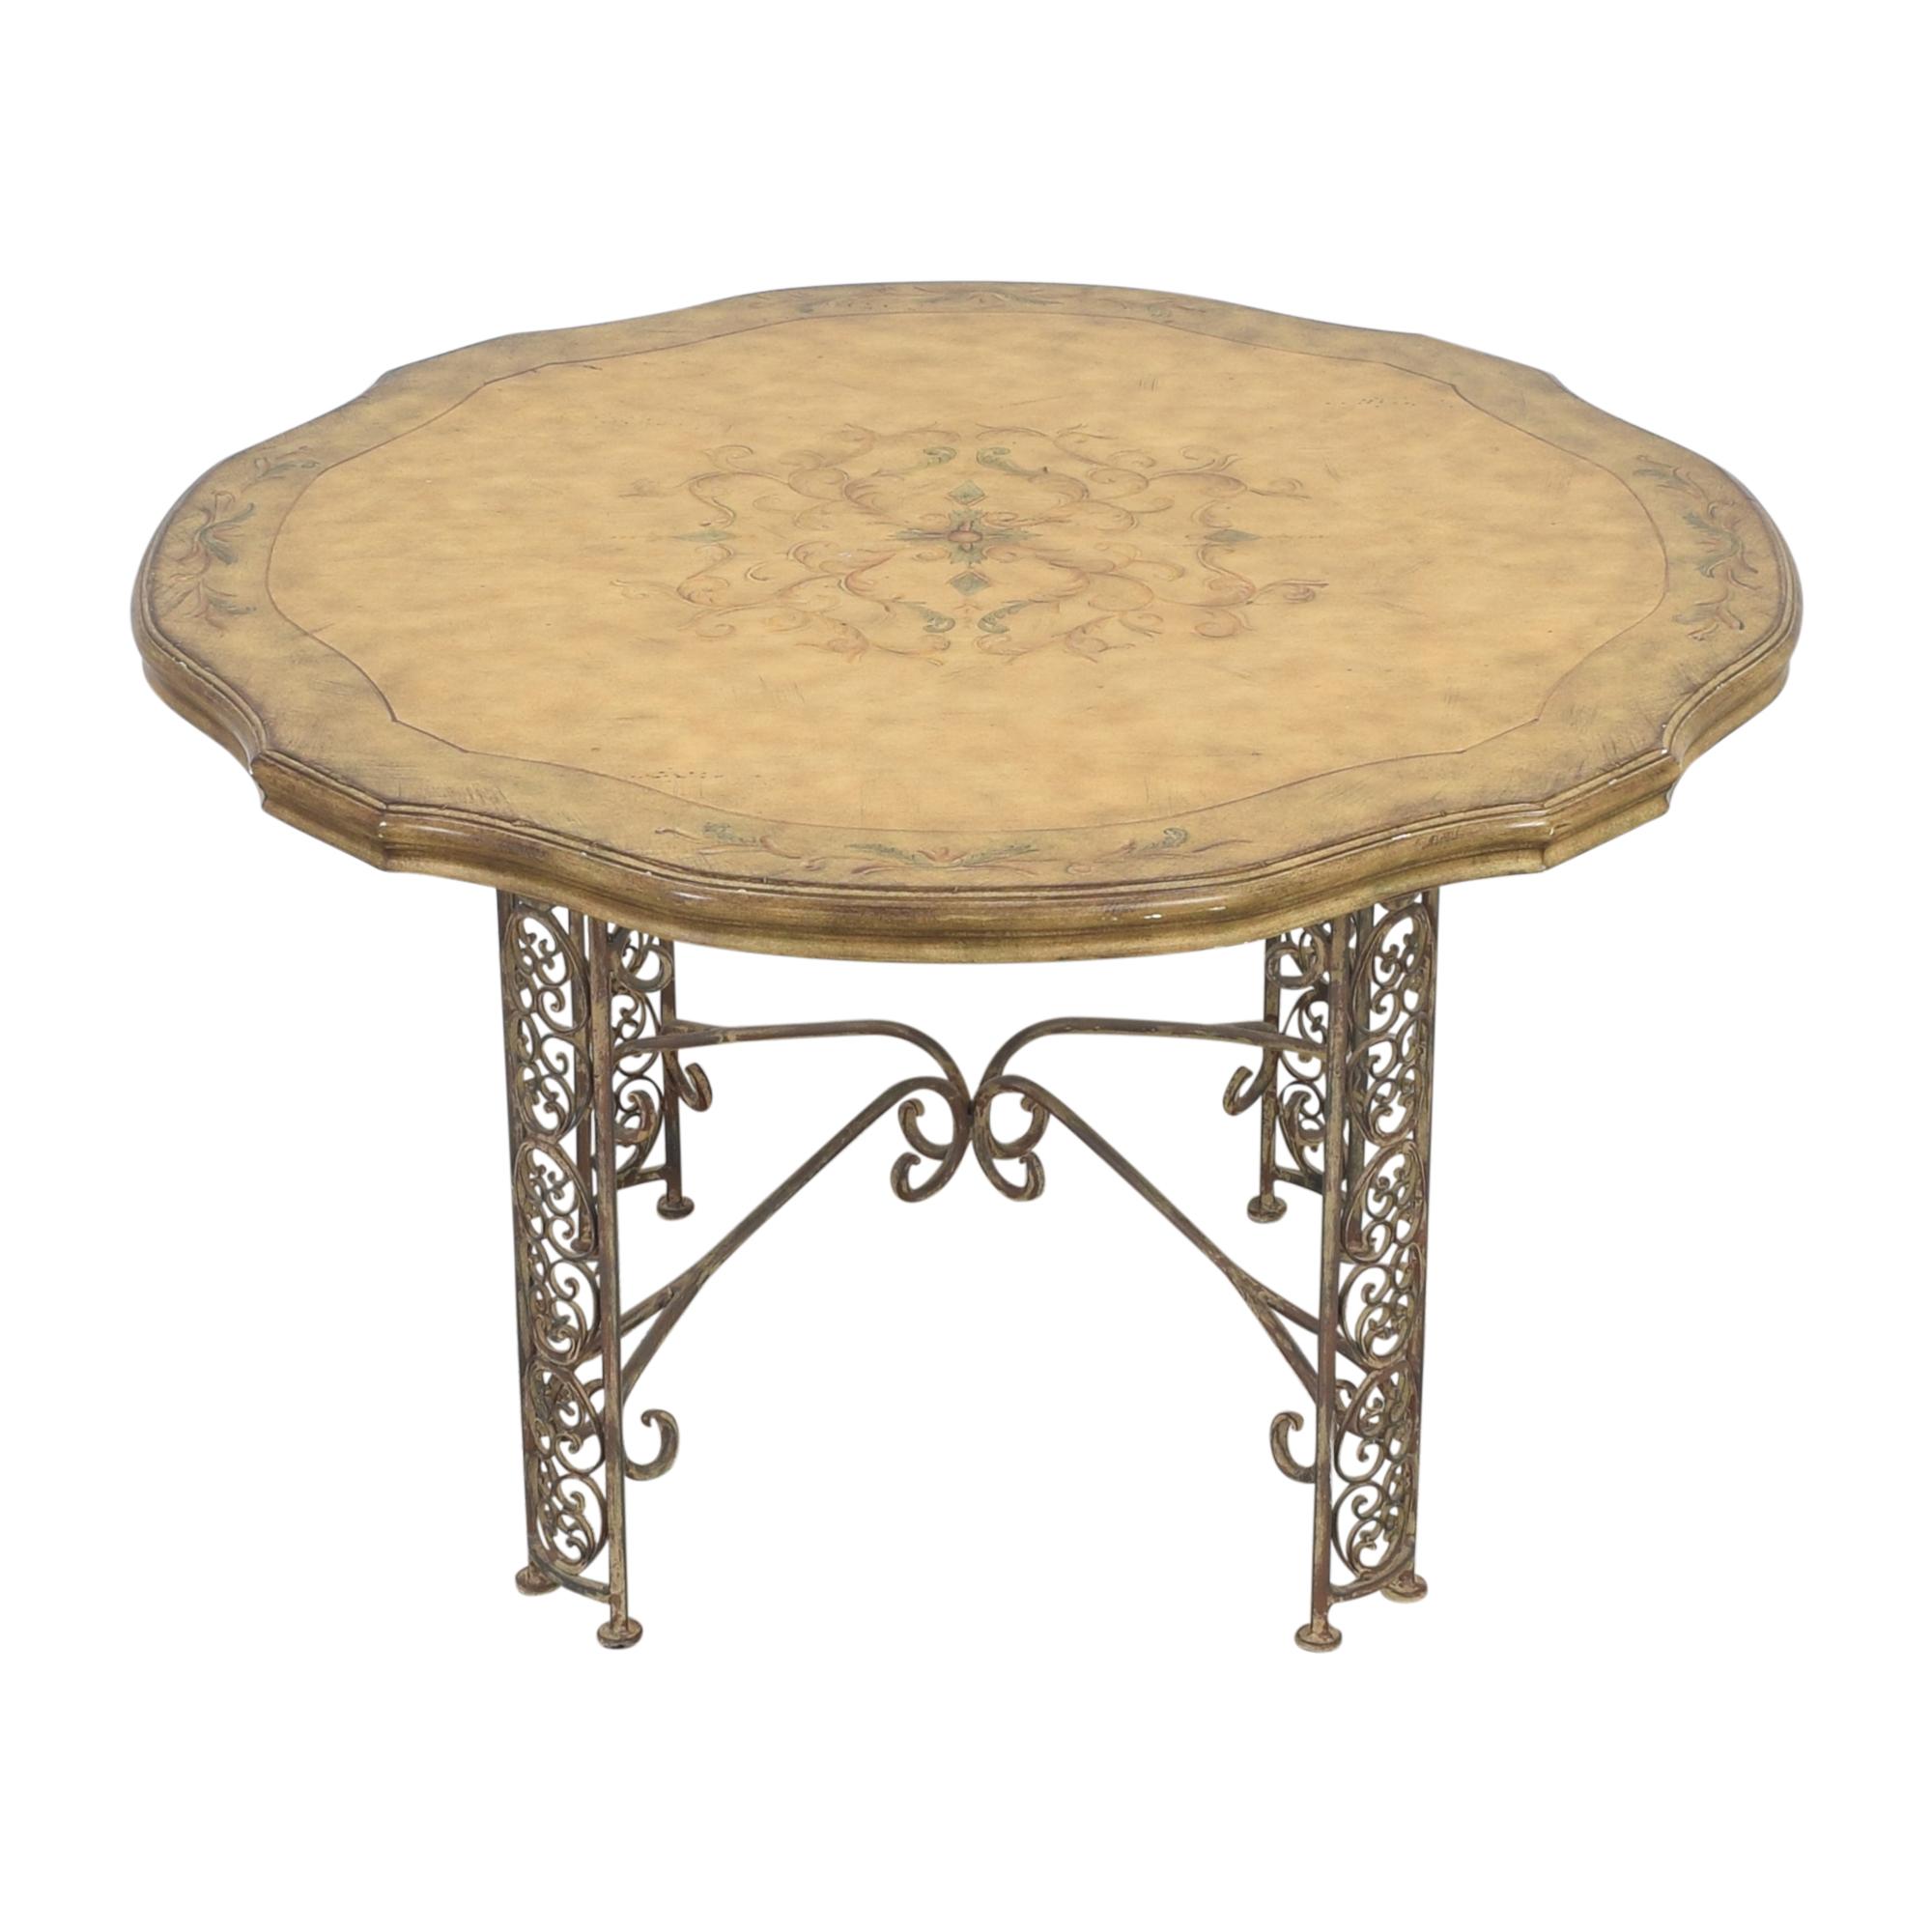 Domain Domain Decorative Round Dining Table nj